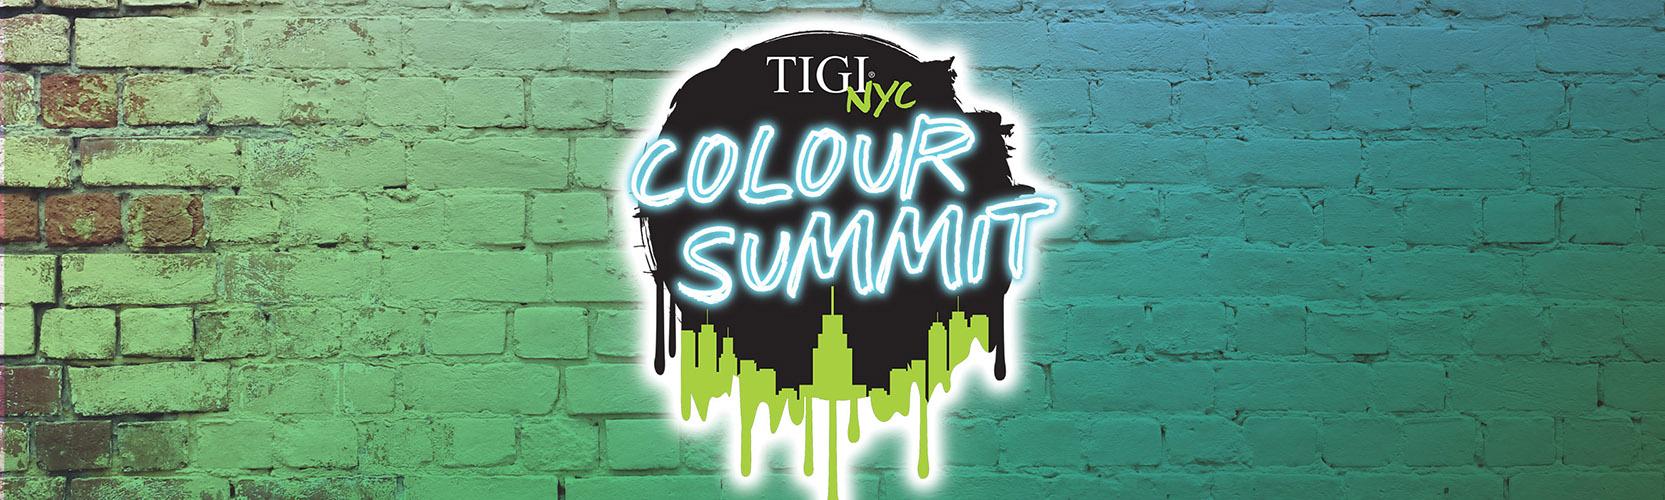 Colour_Summit_Brick_Bannerv2.jpg